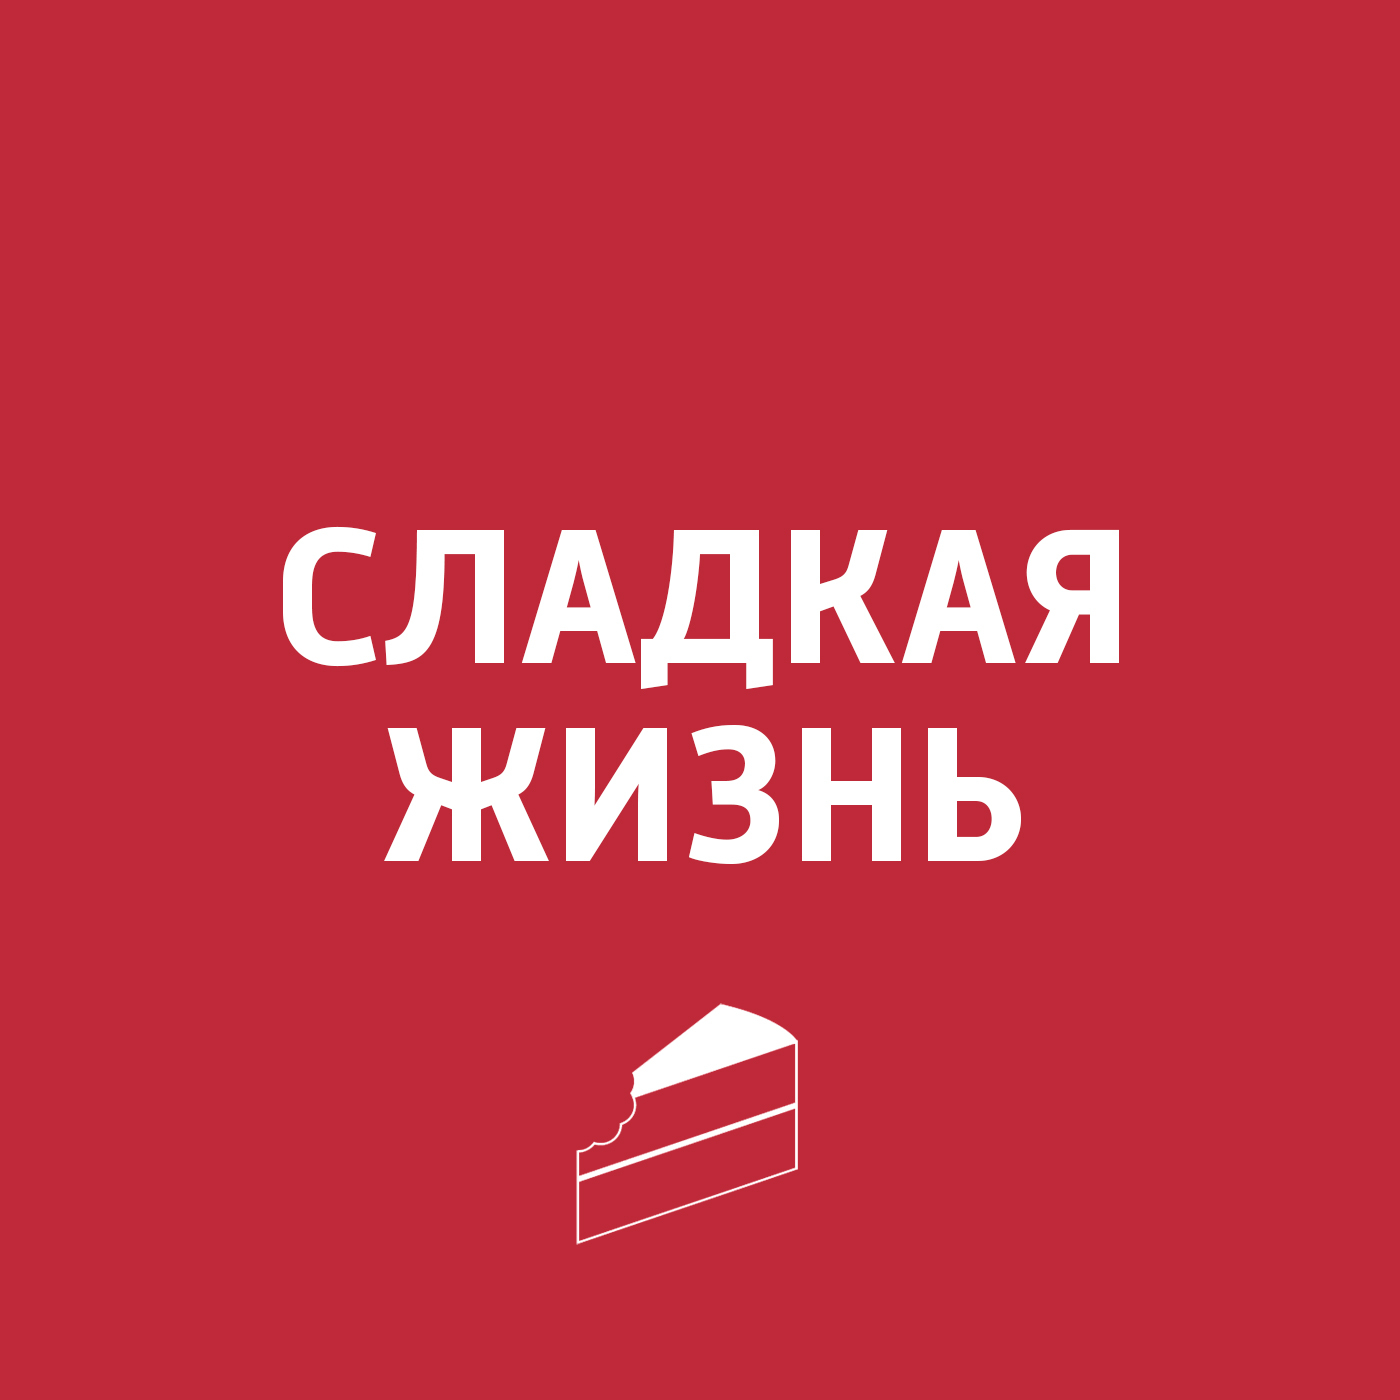 Картаев Павел Тарт Татен ооо шеф маркет томатный тарт с фетой и тархуном